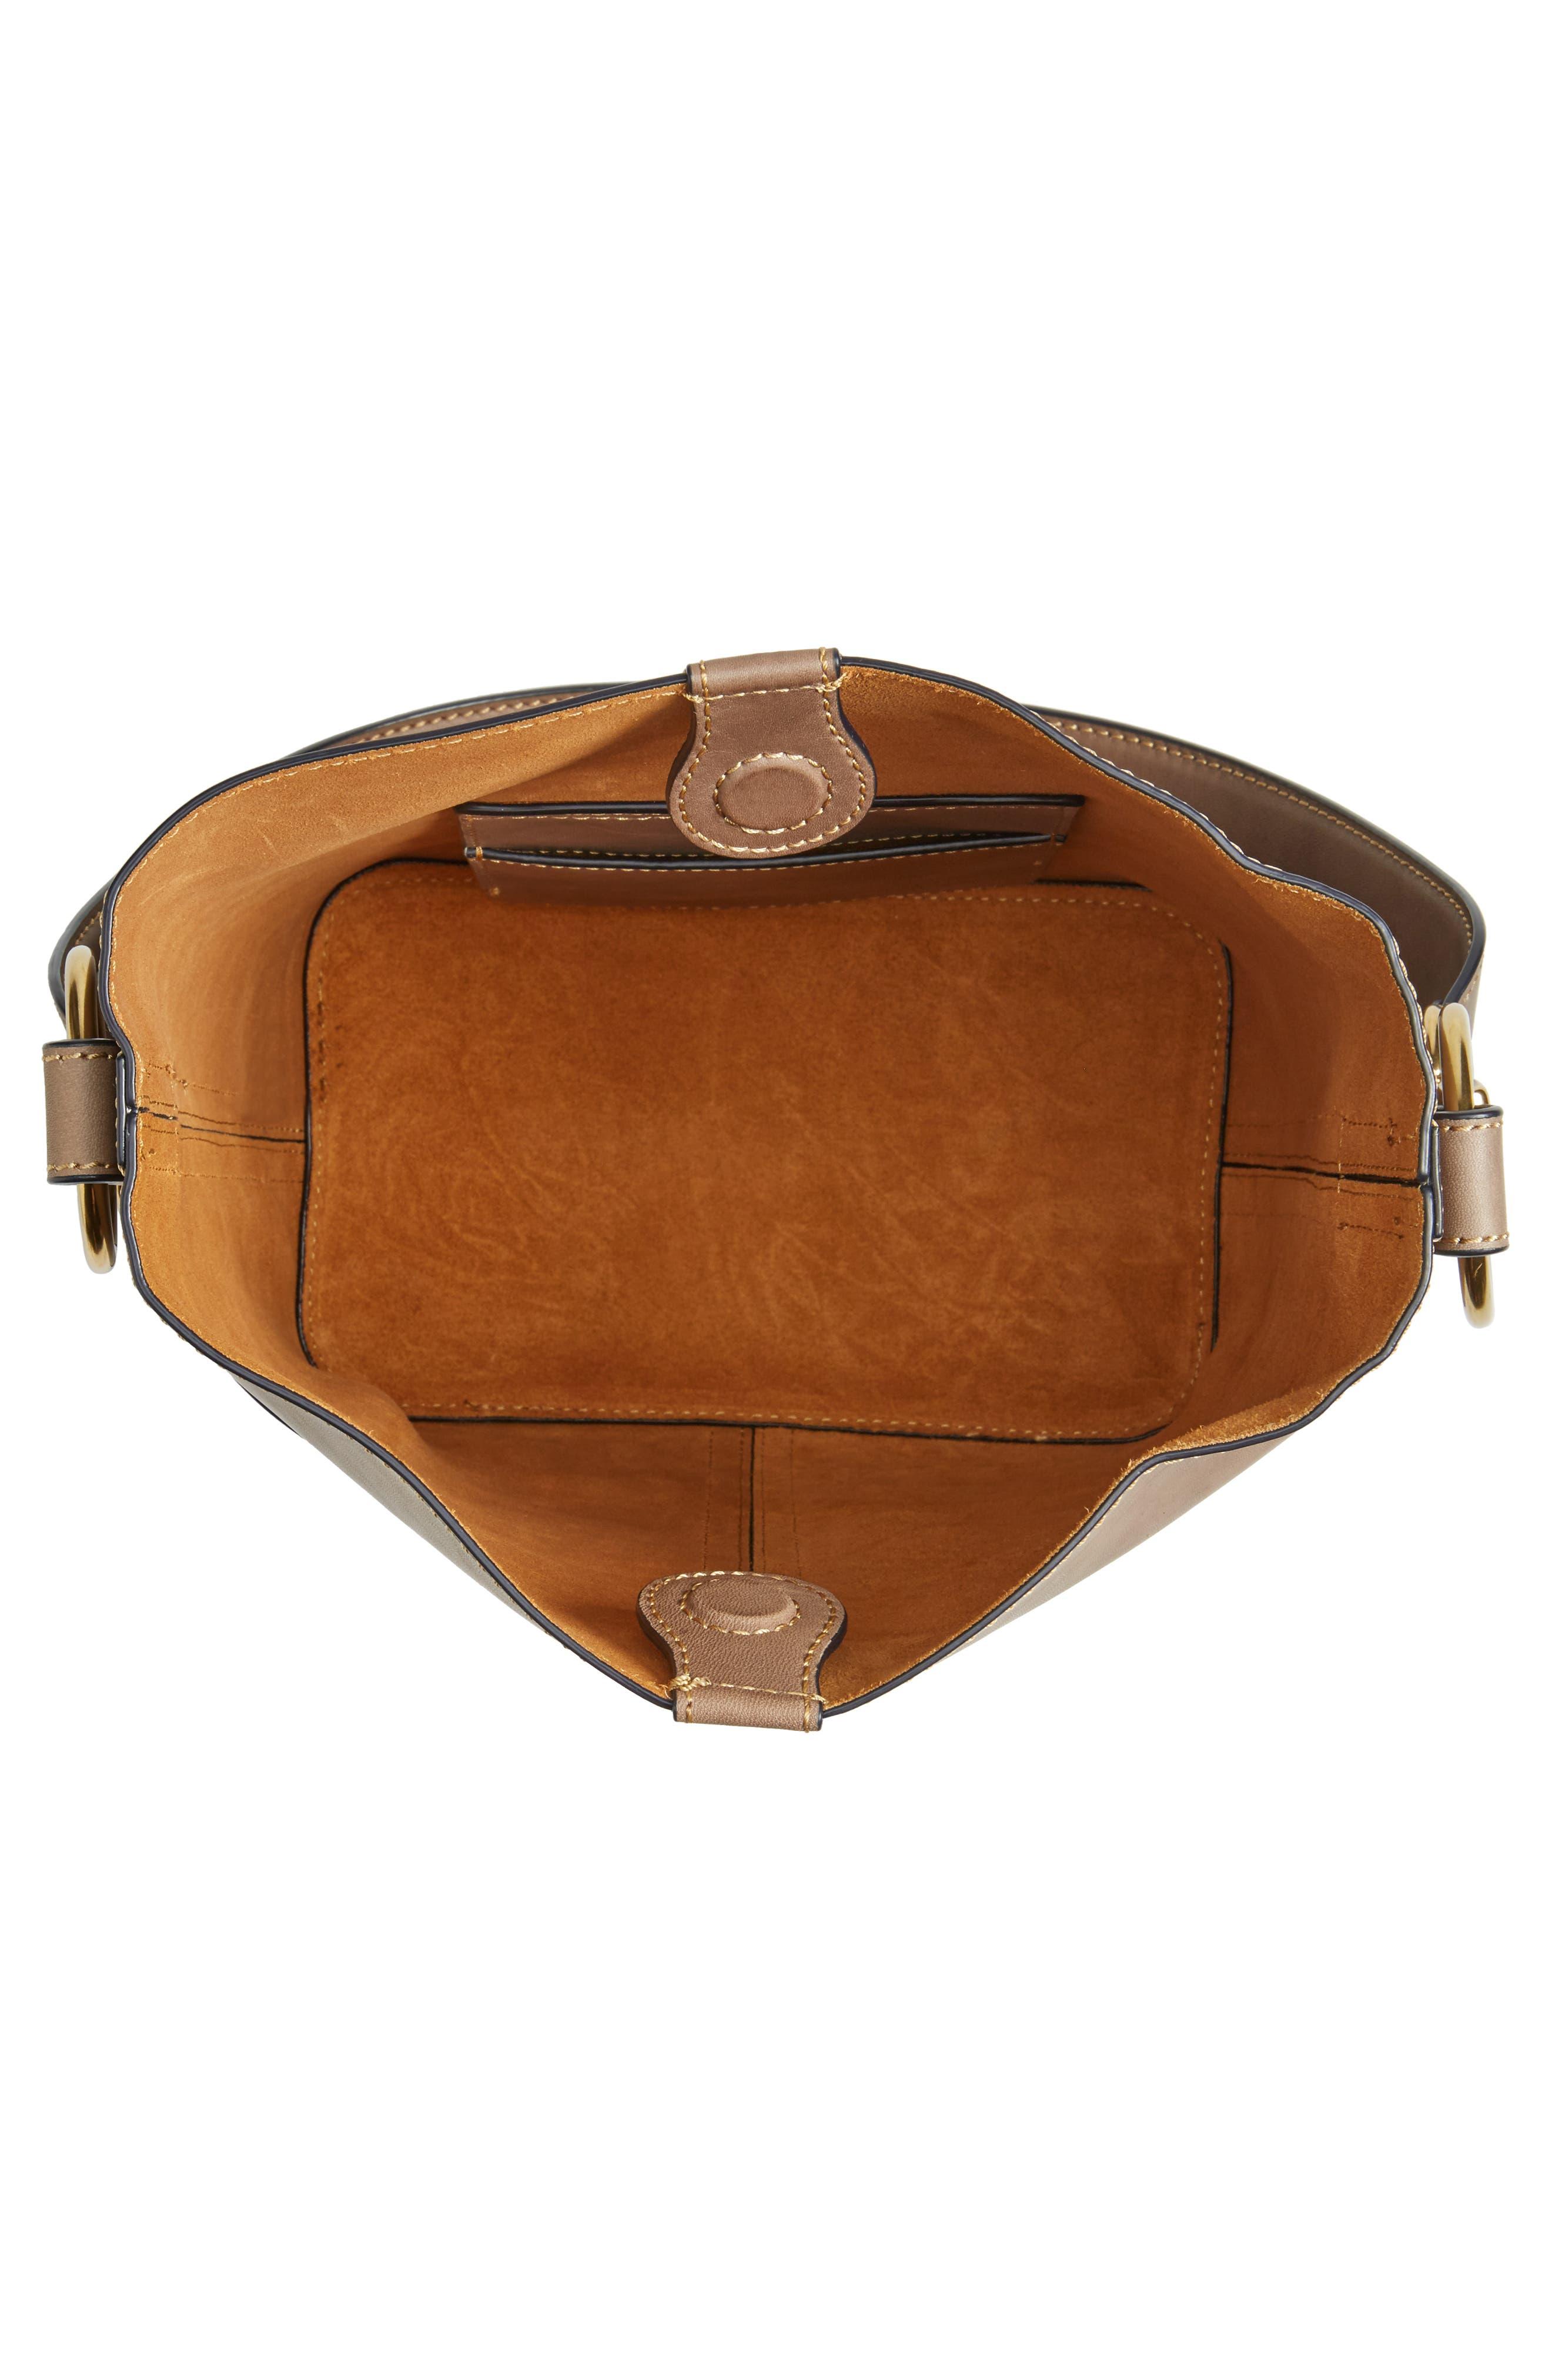 Ilana Leather Bucket Bag,                             Alternate thumbnail 4, color,                             030